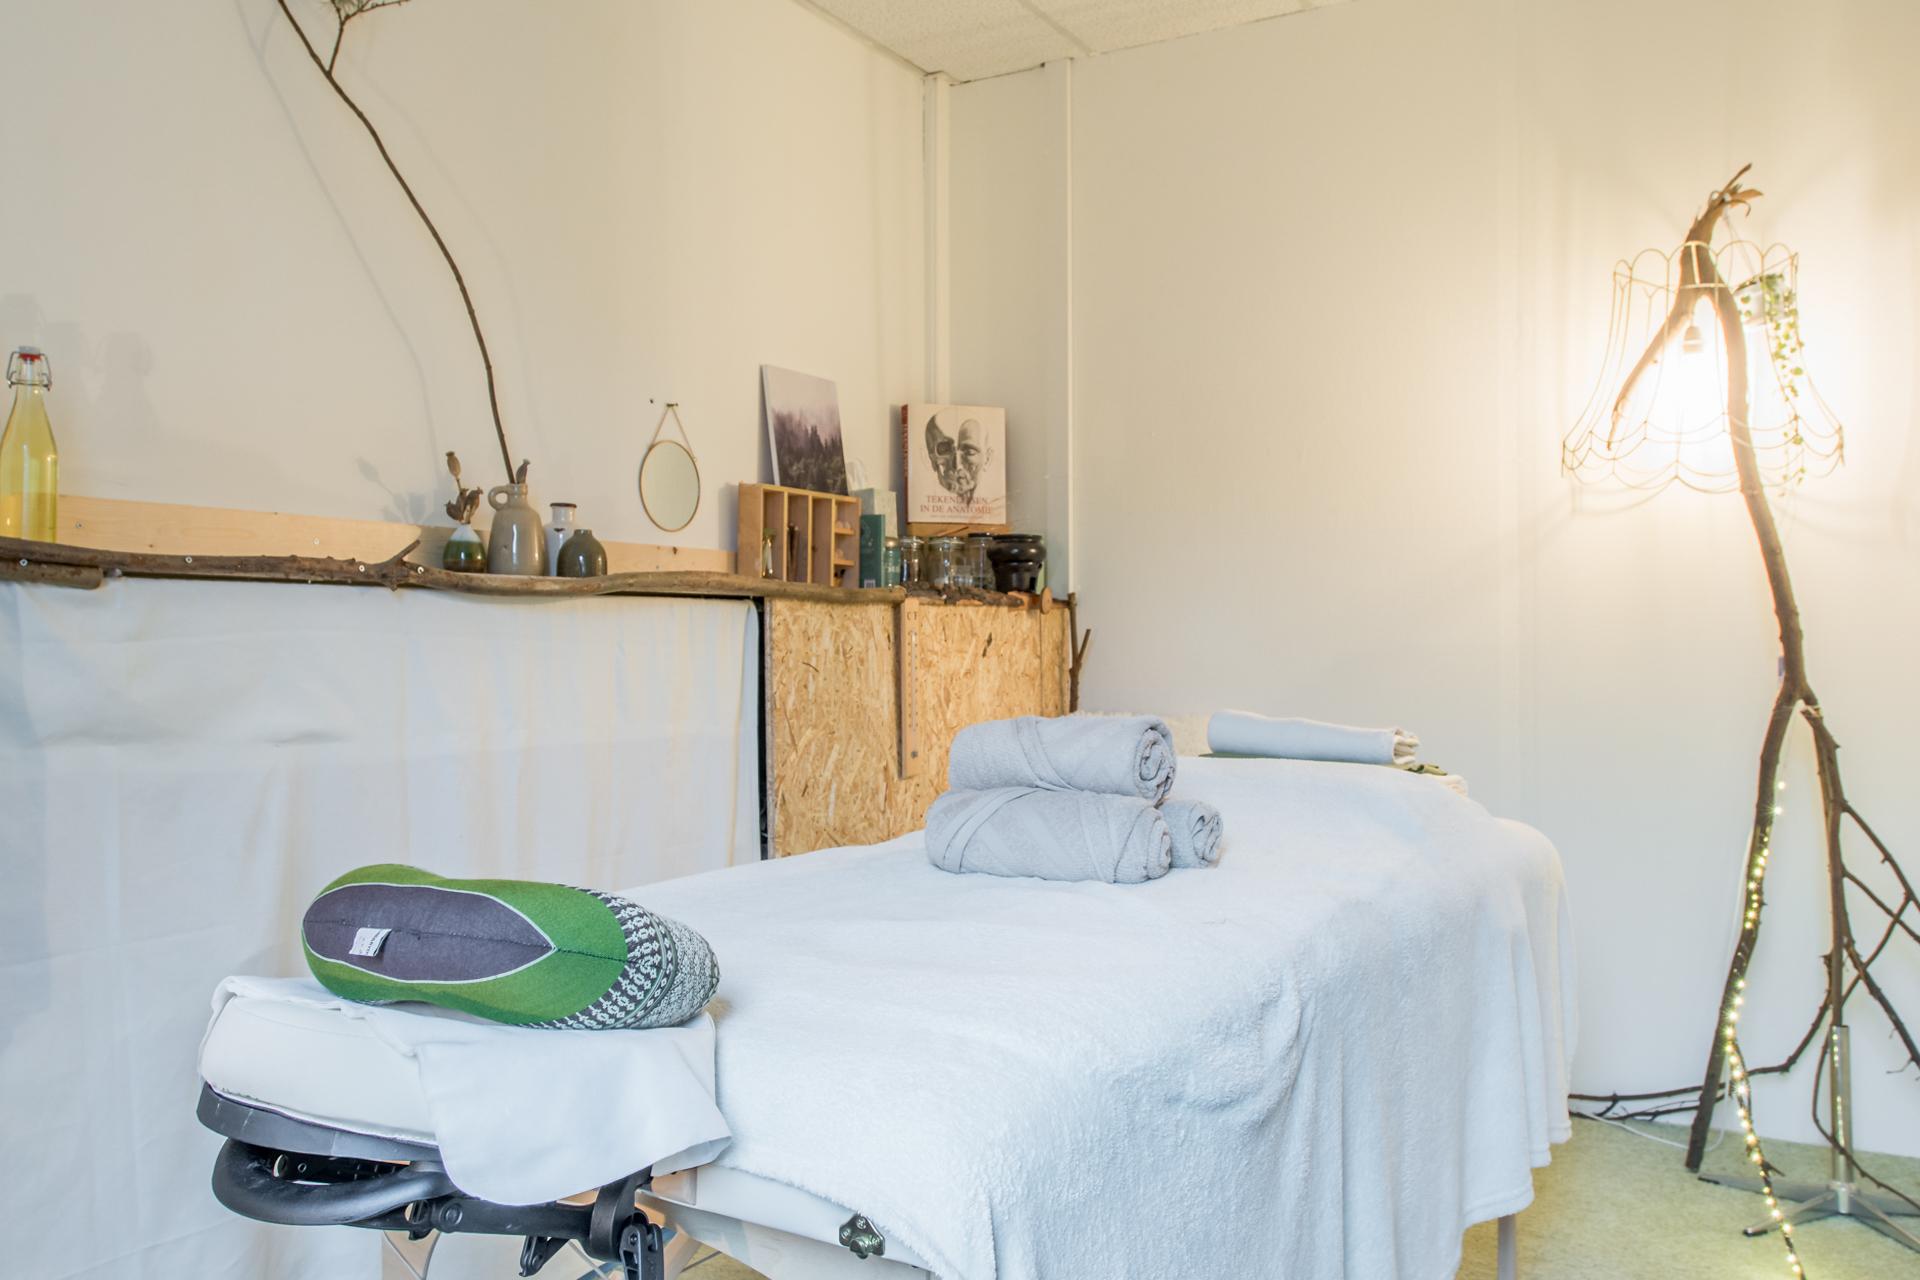 Movement-Matters-Marielle-Massage-in-Noord-binnen-kijken